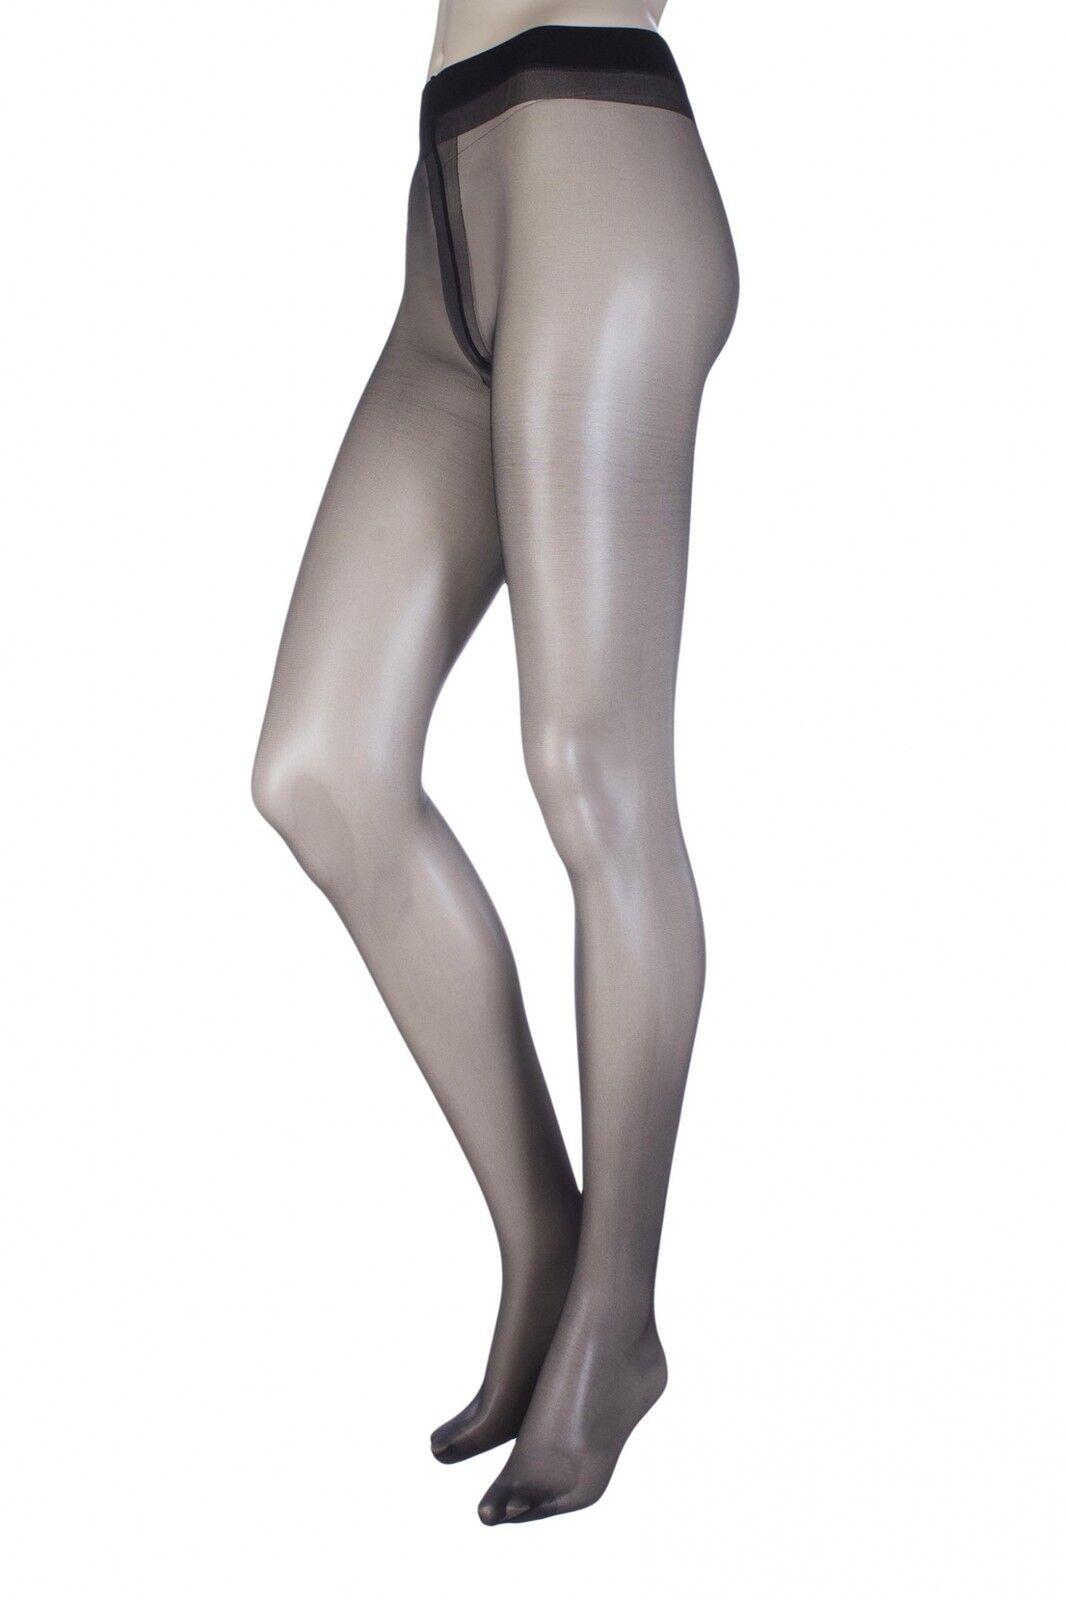 7d0c3a2d6f4 Oroblu Sensual Tights Black L for sale online